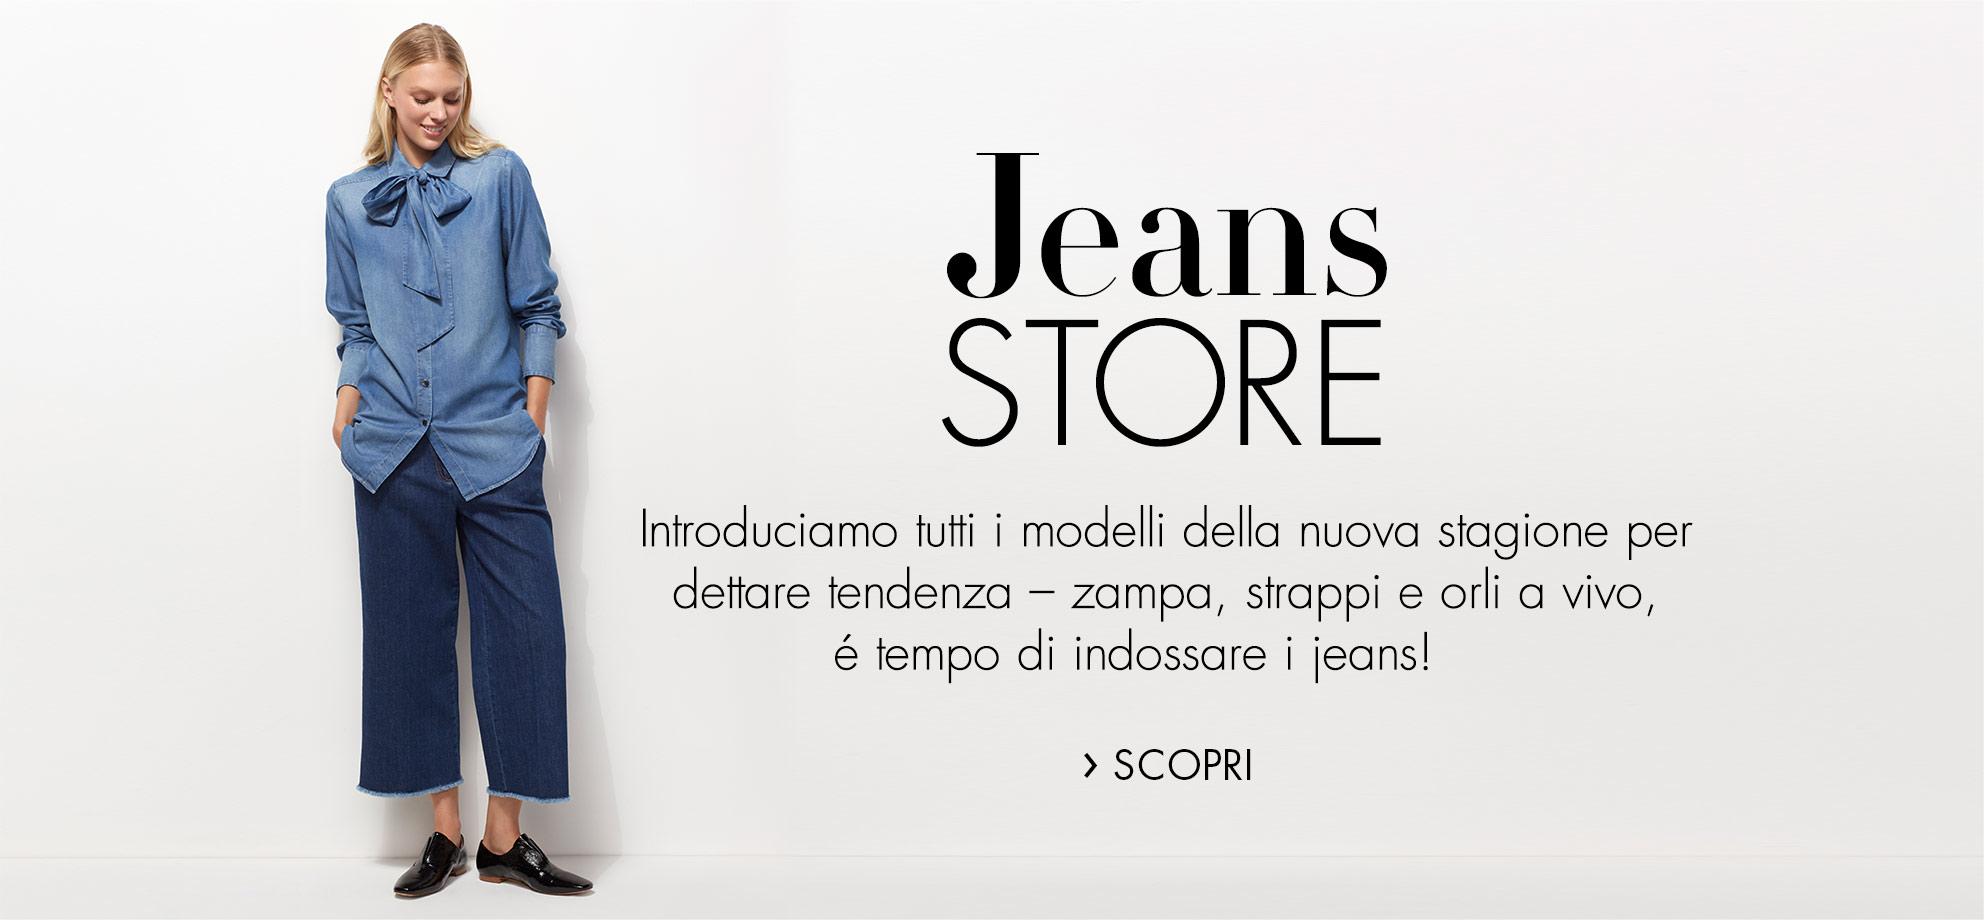 Novità Jeans